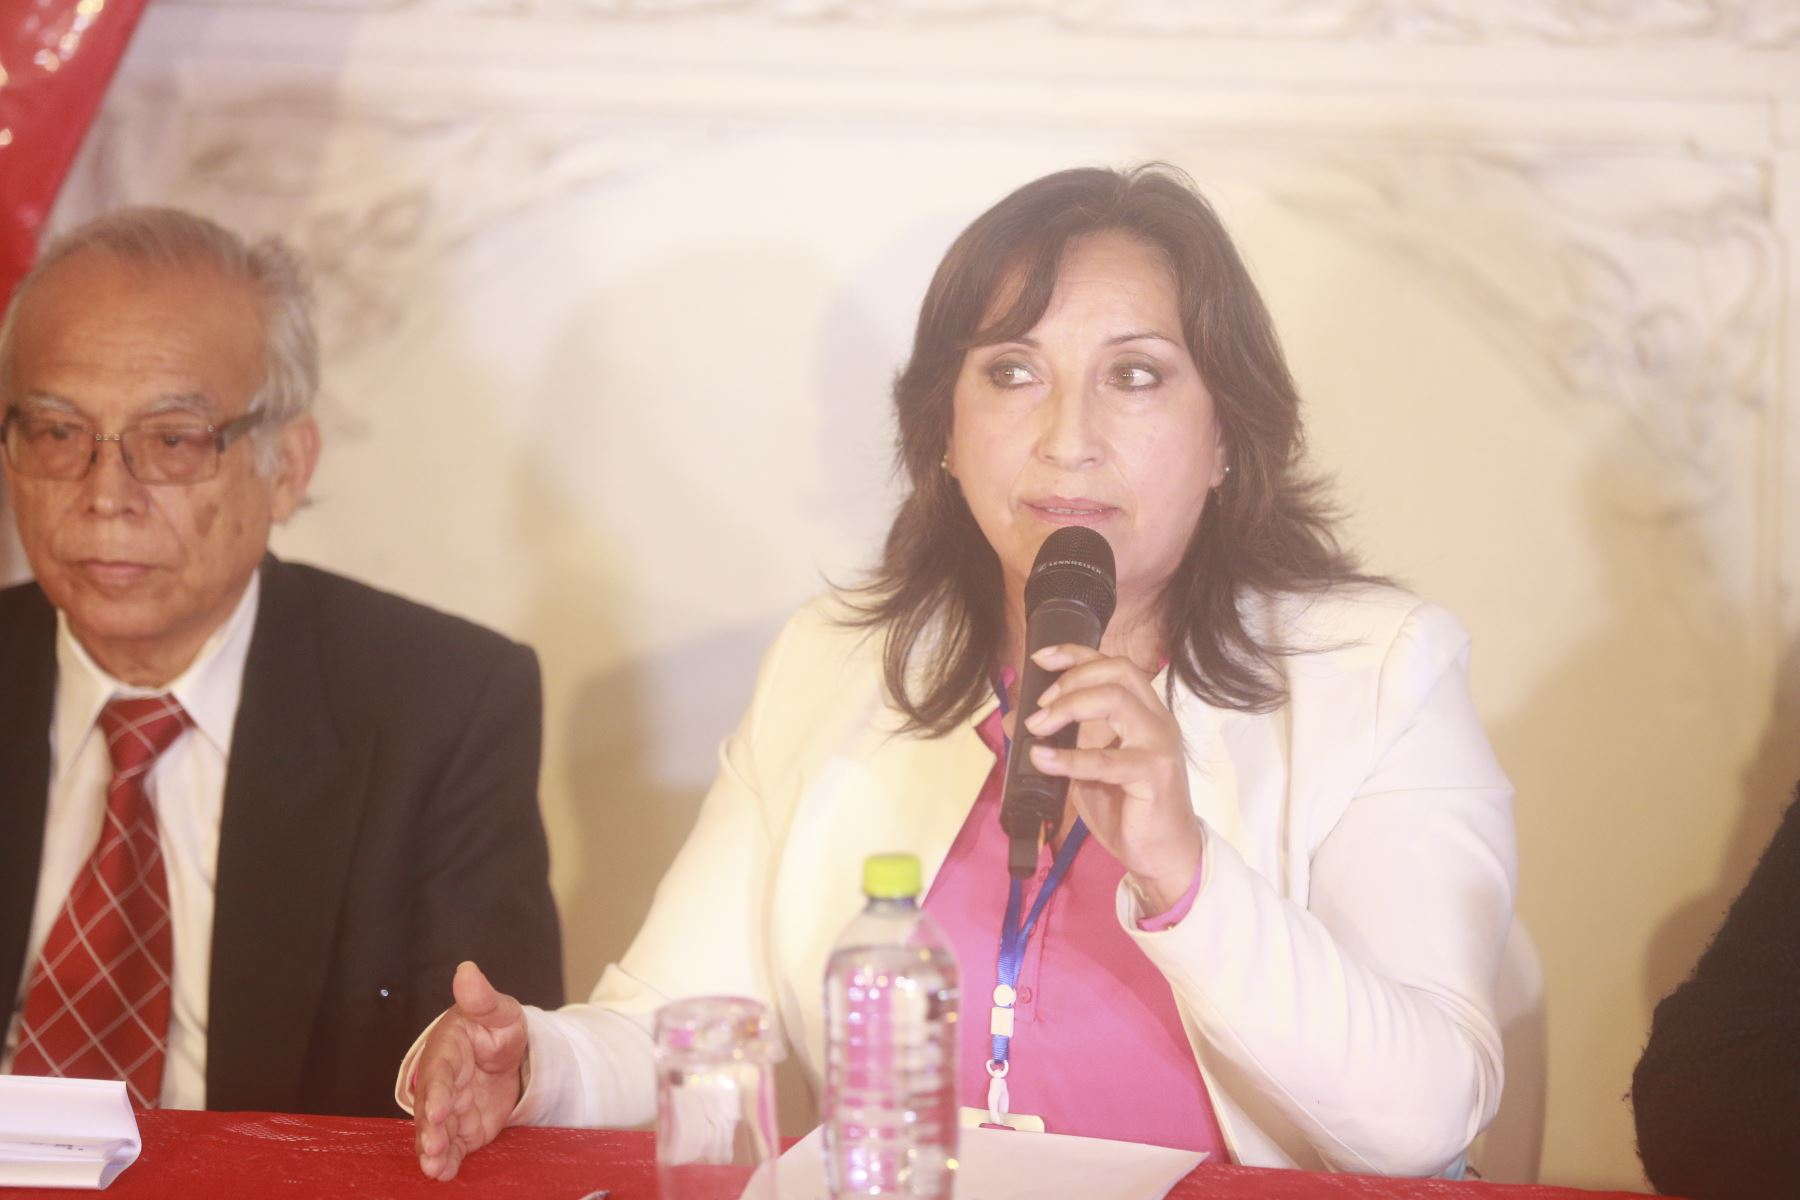 Dina Boluarte de Perú Libre brinda conferencia de prensa. Foto: ANDINA/Jhony Laurente